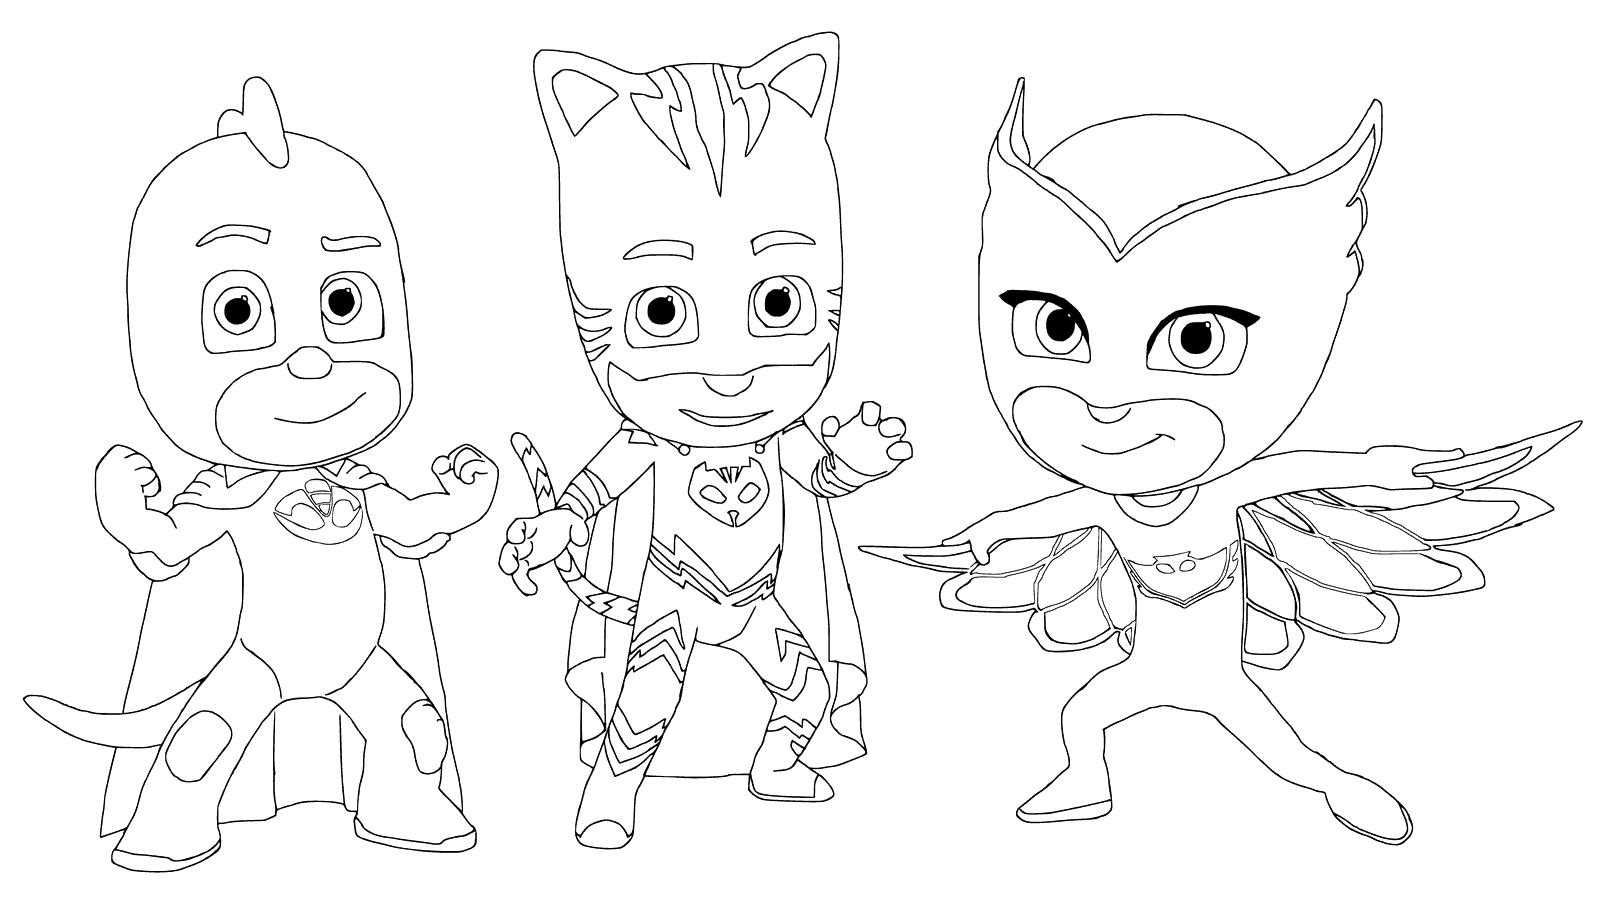 Desenhos De Super Herois Para Imprimir E Colorir